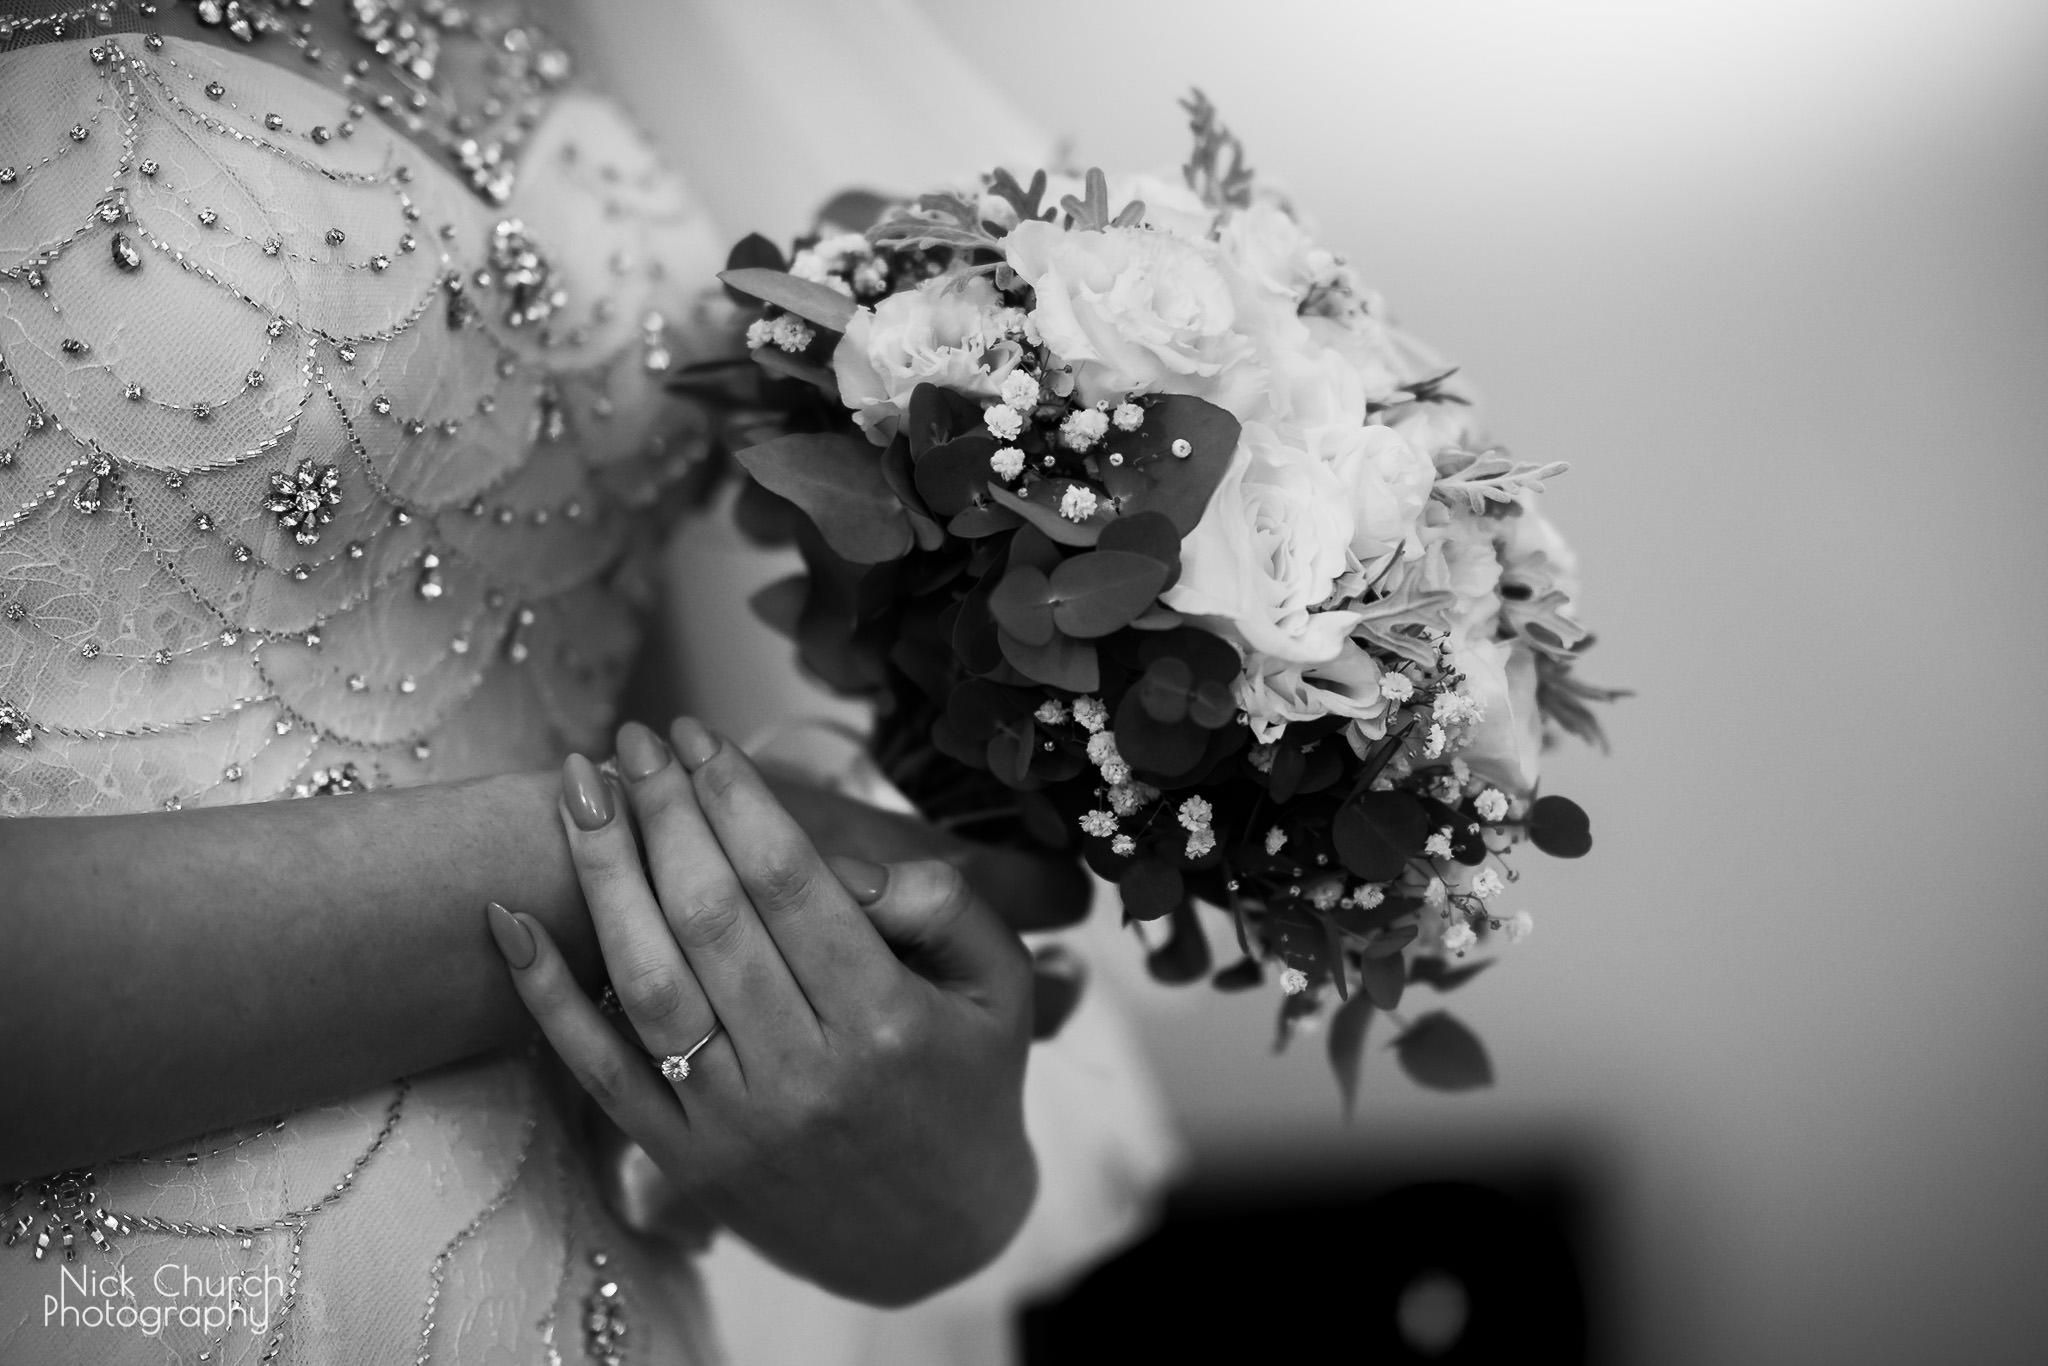 NC-20180317-stacy-and-mike-wedding-0188.jpg